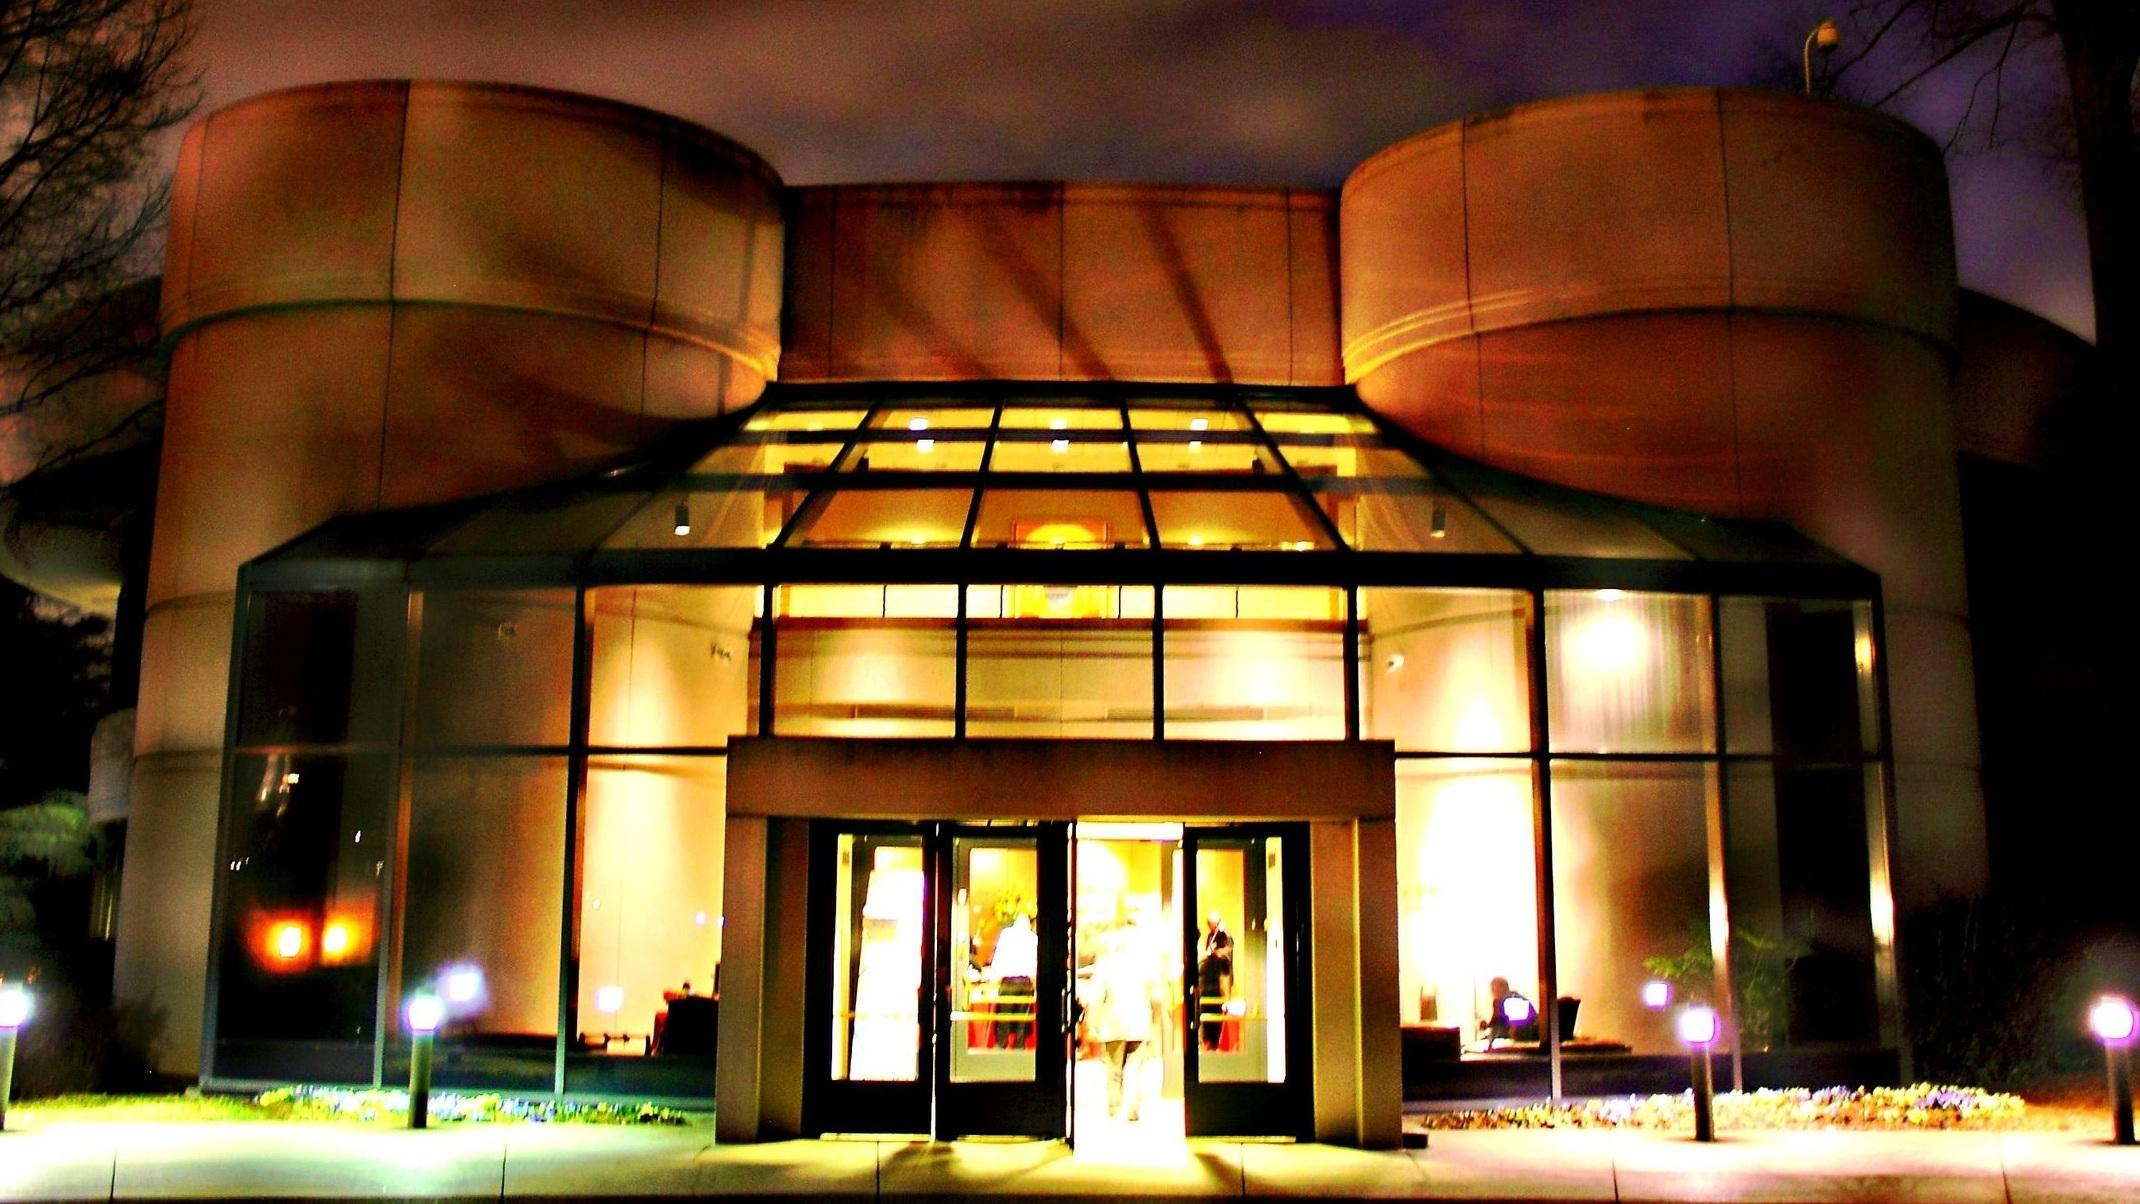 The Ivan Allen III Pavilion at the Carter Center | 453 John Lewis Freedom Parkway | Atlanta, GA 30307